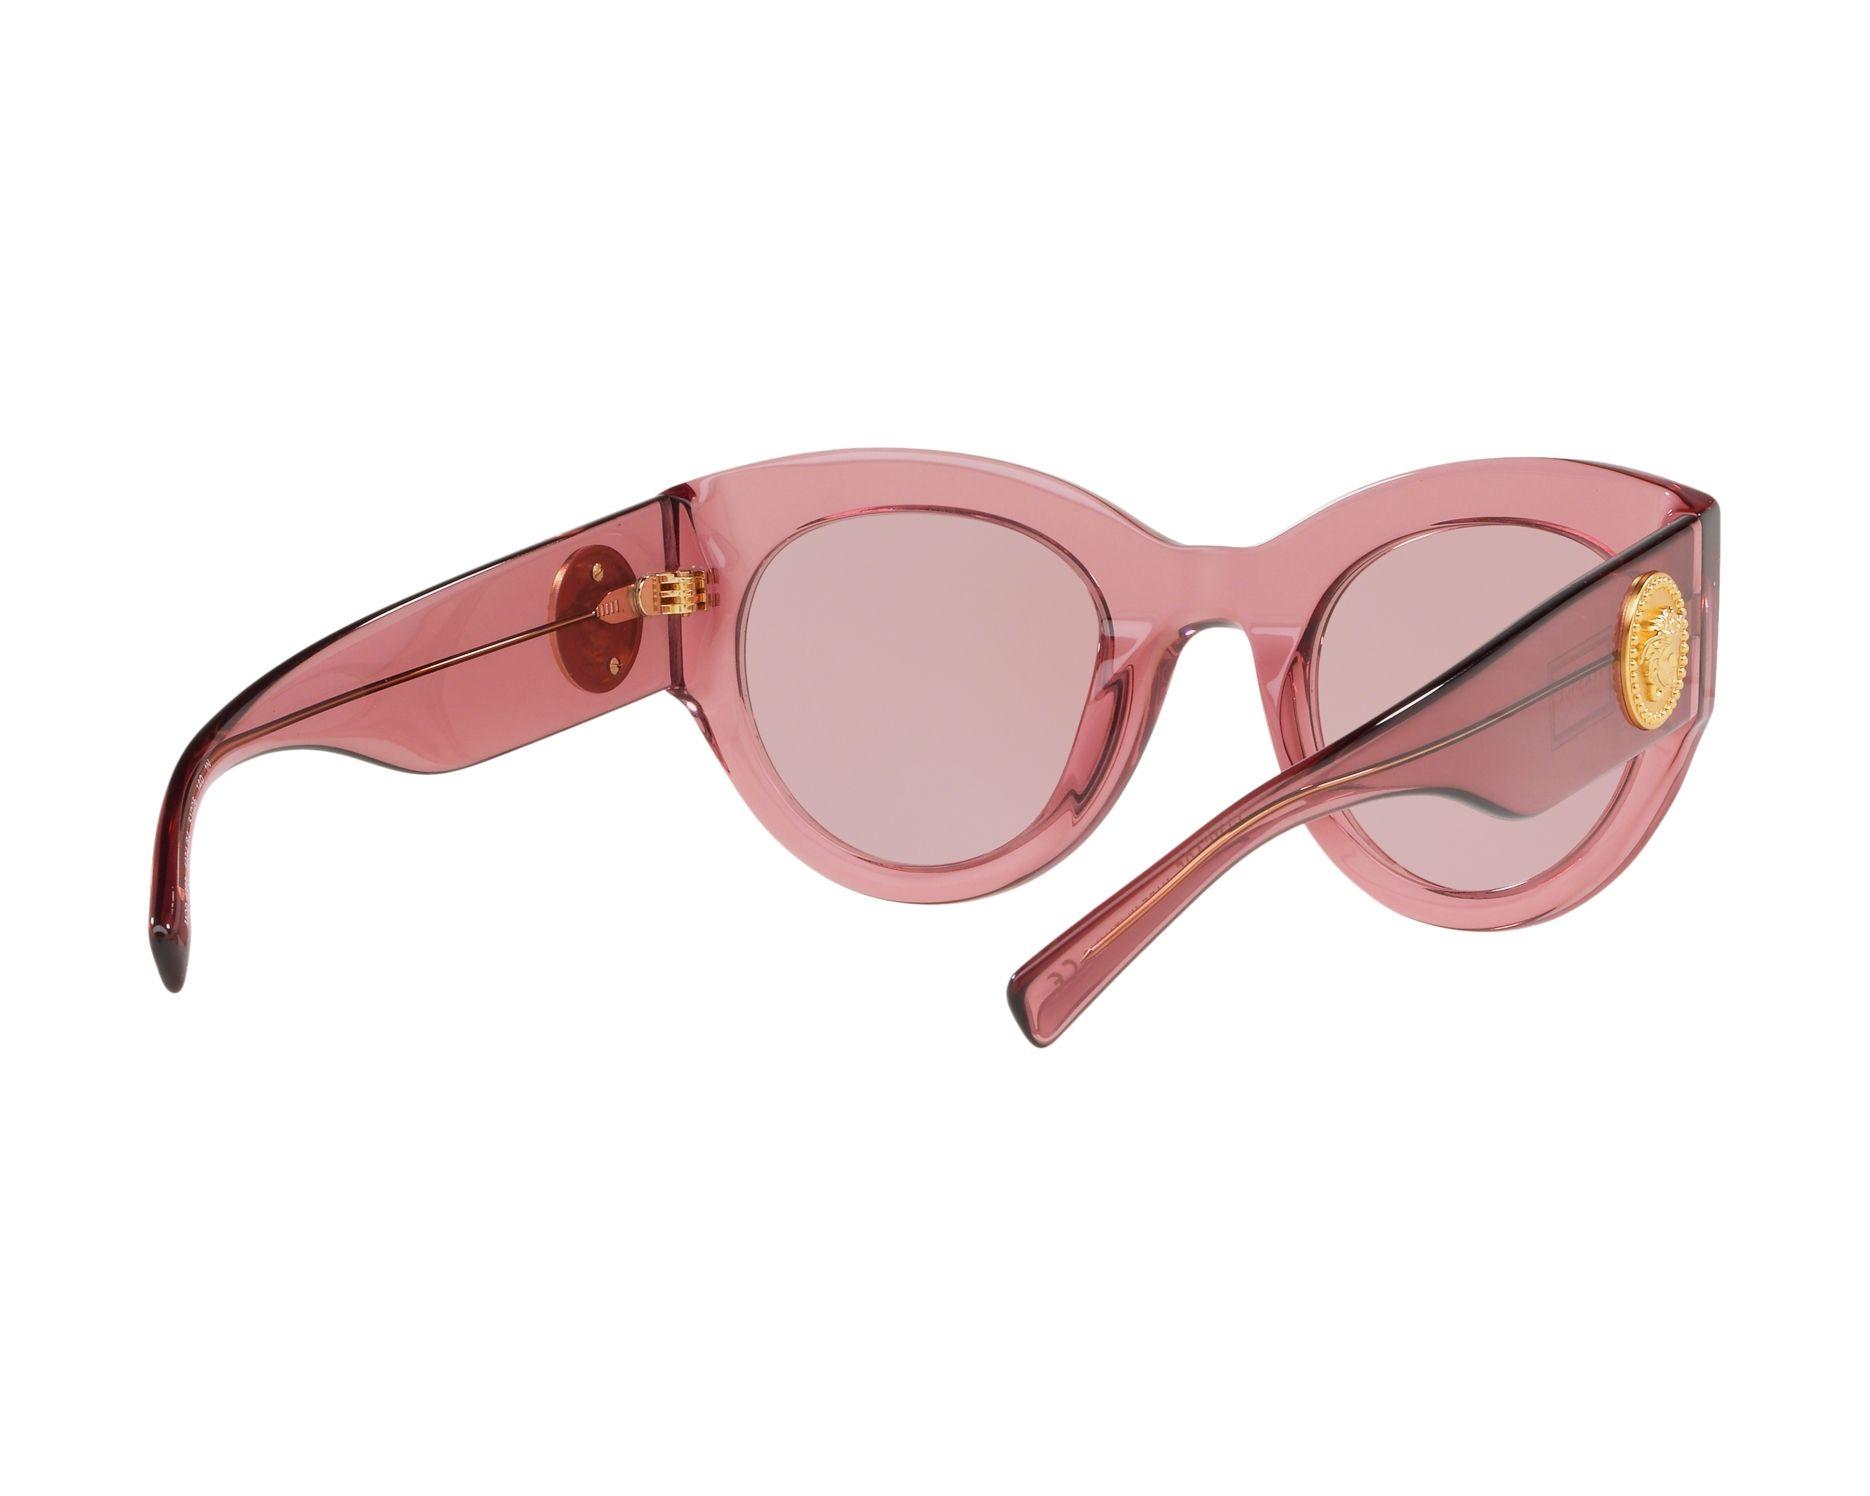 908218d2a54 Sunglasses Versace VE-4353 523484 51-25 Rosa 360 degree view 8